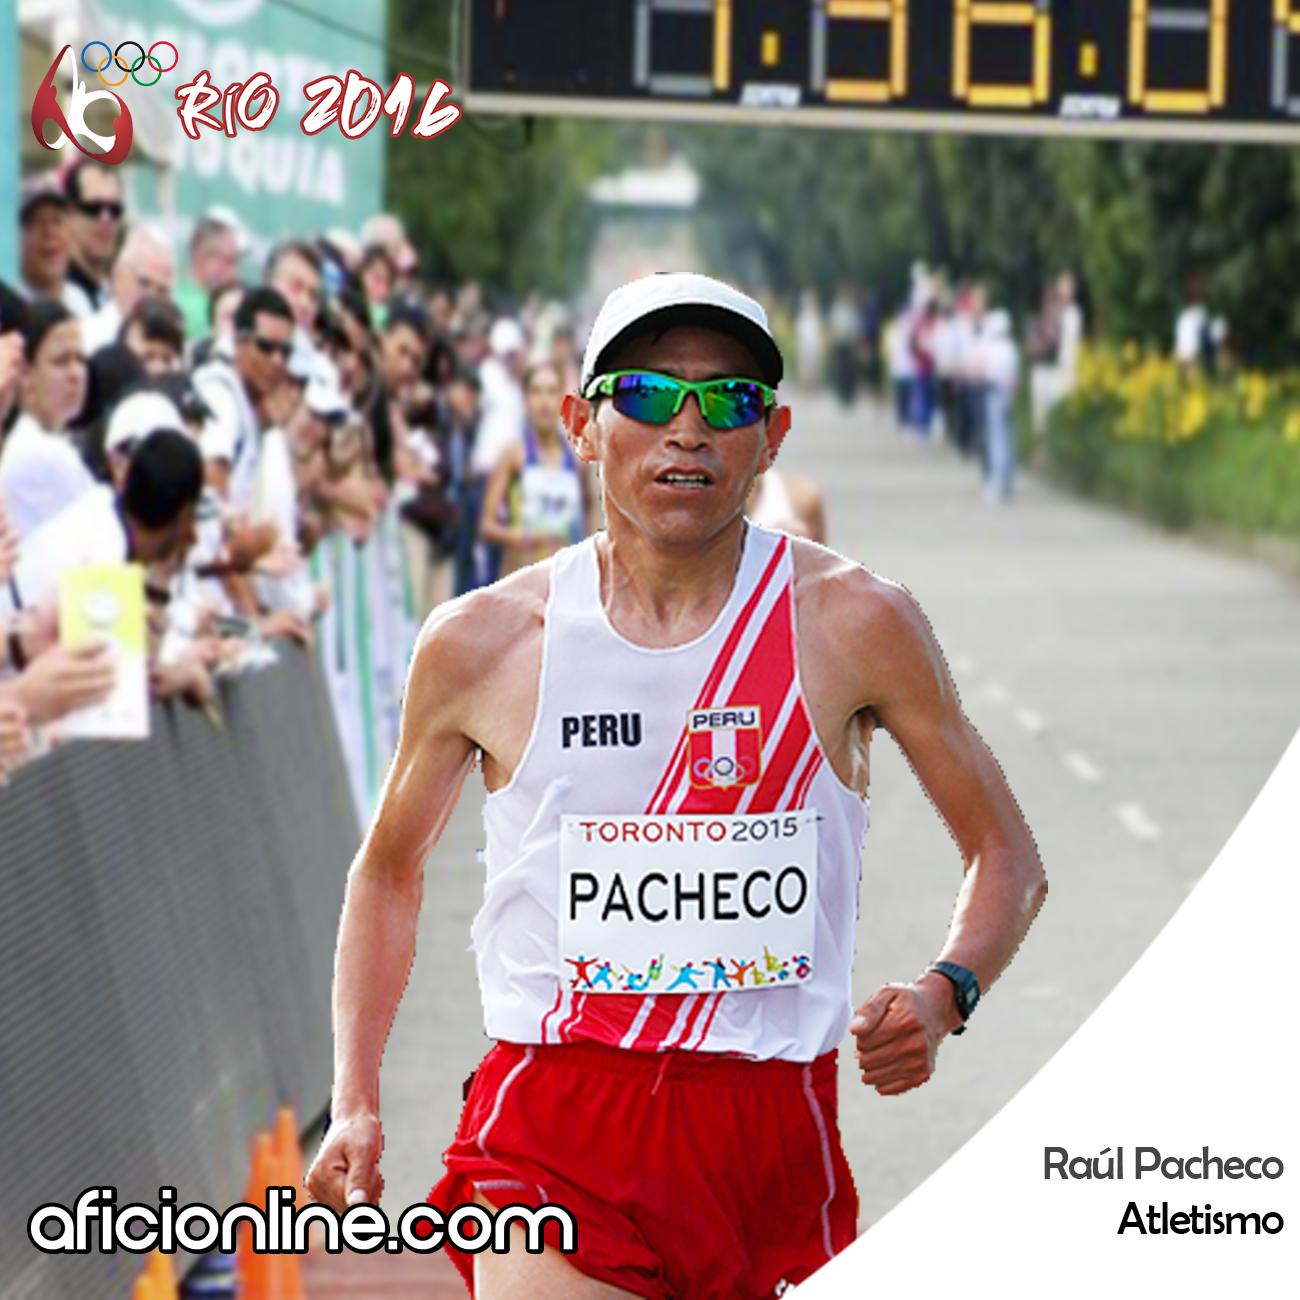 Raul Pacheco Rio 2